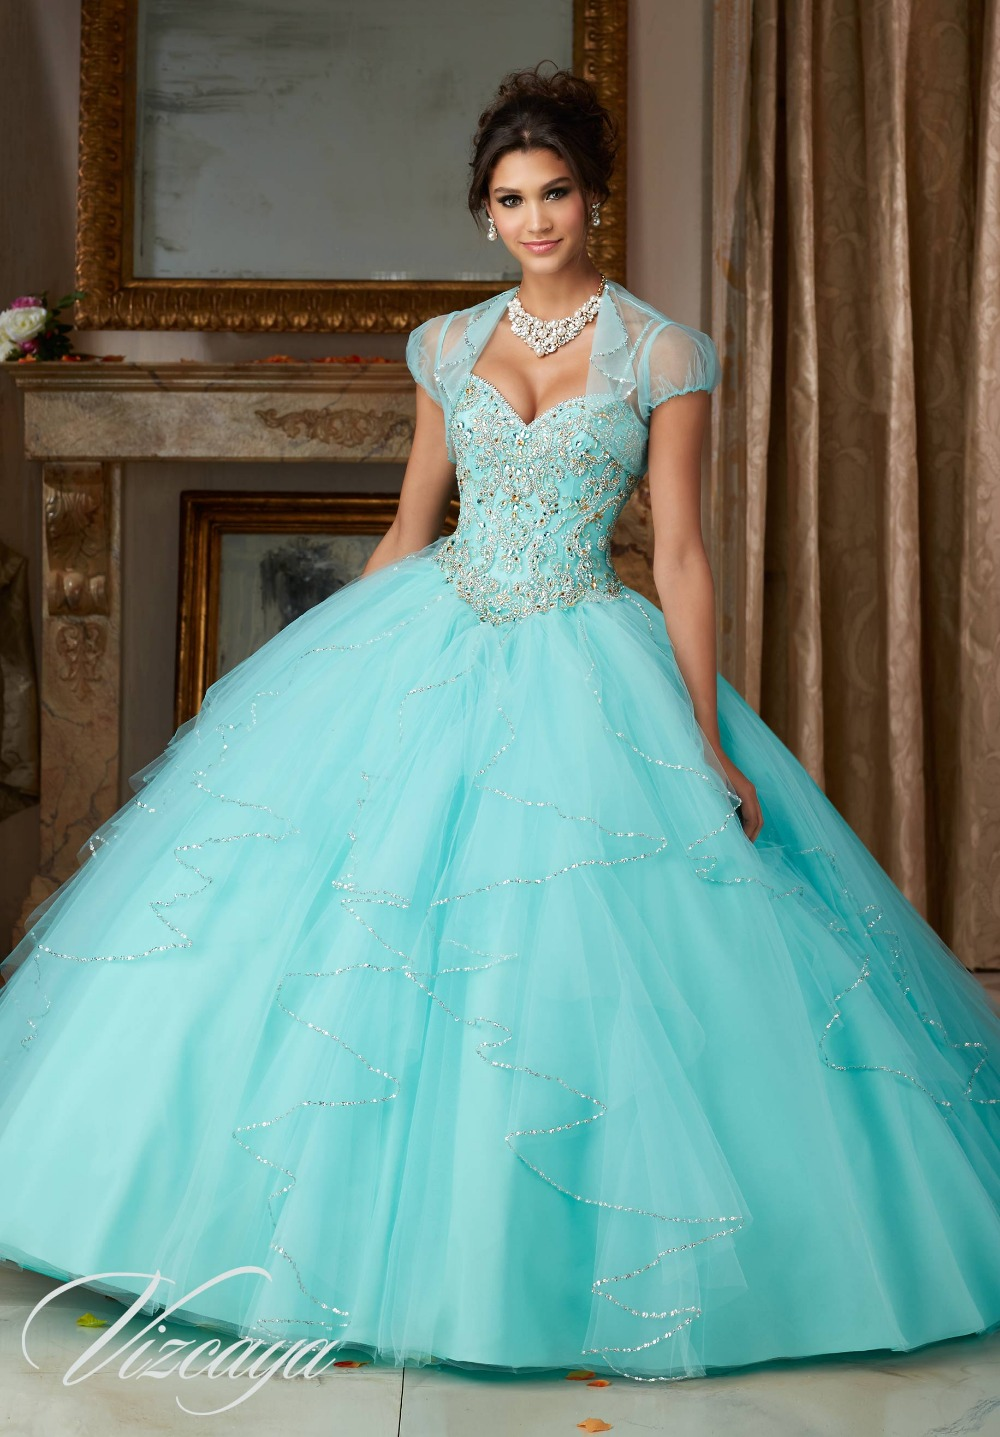 Aqua Blue Quinceanera Dresses Reviews - Online Shopping Aqua Blue ...